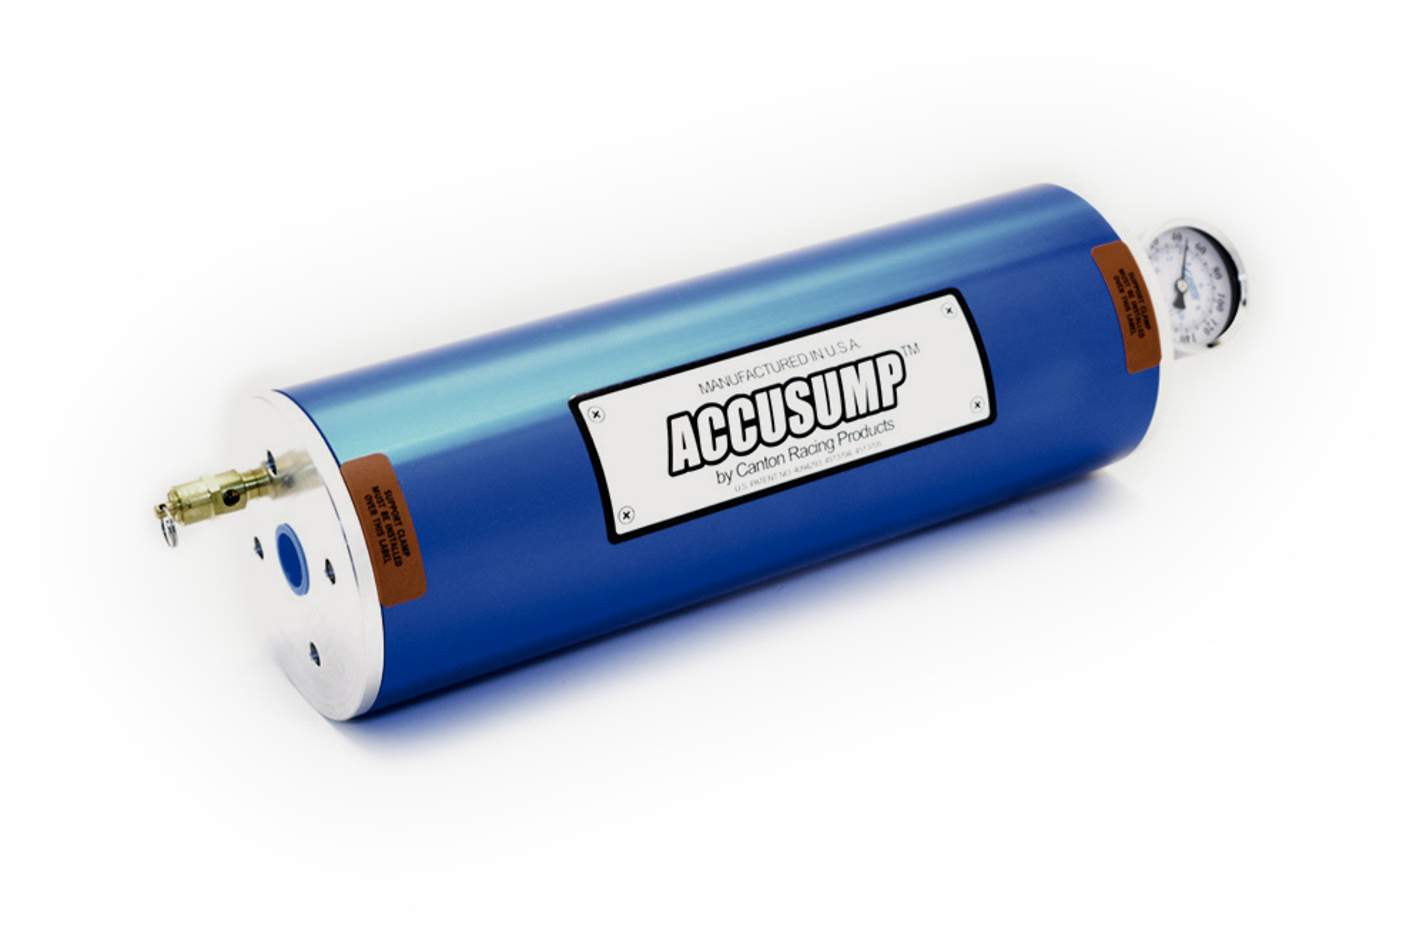 Canton 24-026 Oil Accumulator, Accusump, 2 qt Capacity, 4-1/4 in Diameter, 12 in Long, 1/2 in NPT, Aluminum, Blue Anodized, Each